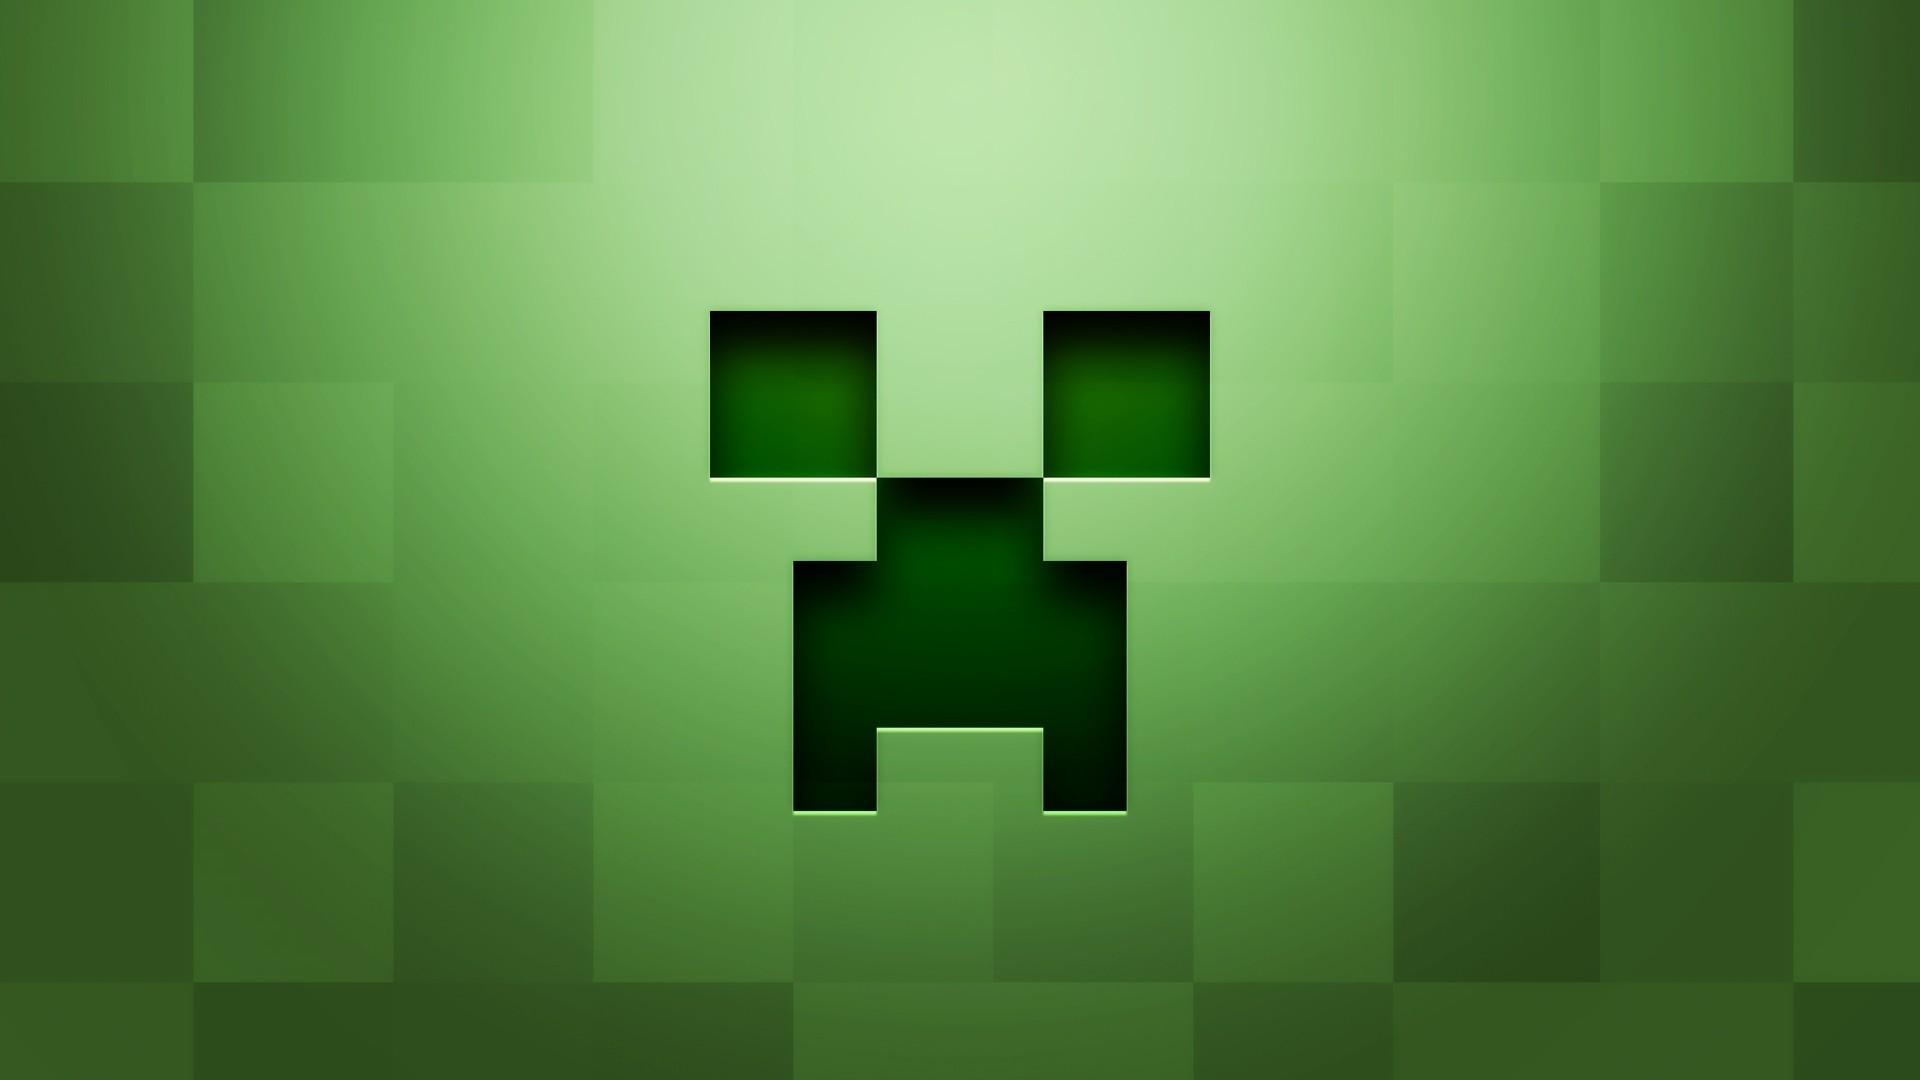 Minecraft Wallpapers 1920x1080 Windows Xp